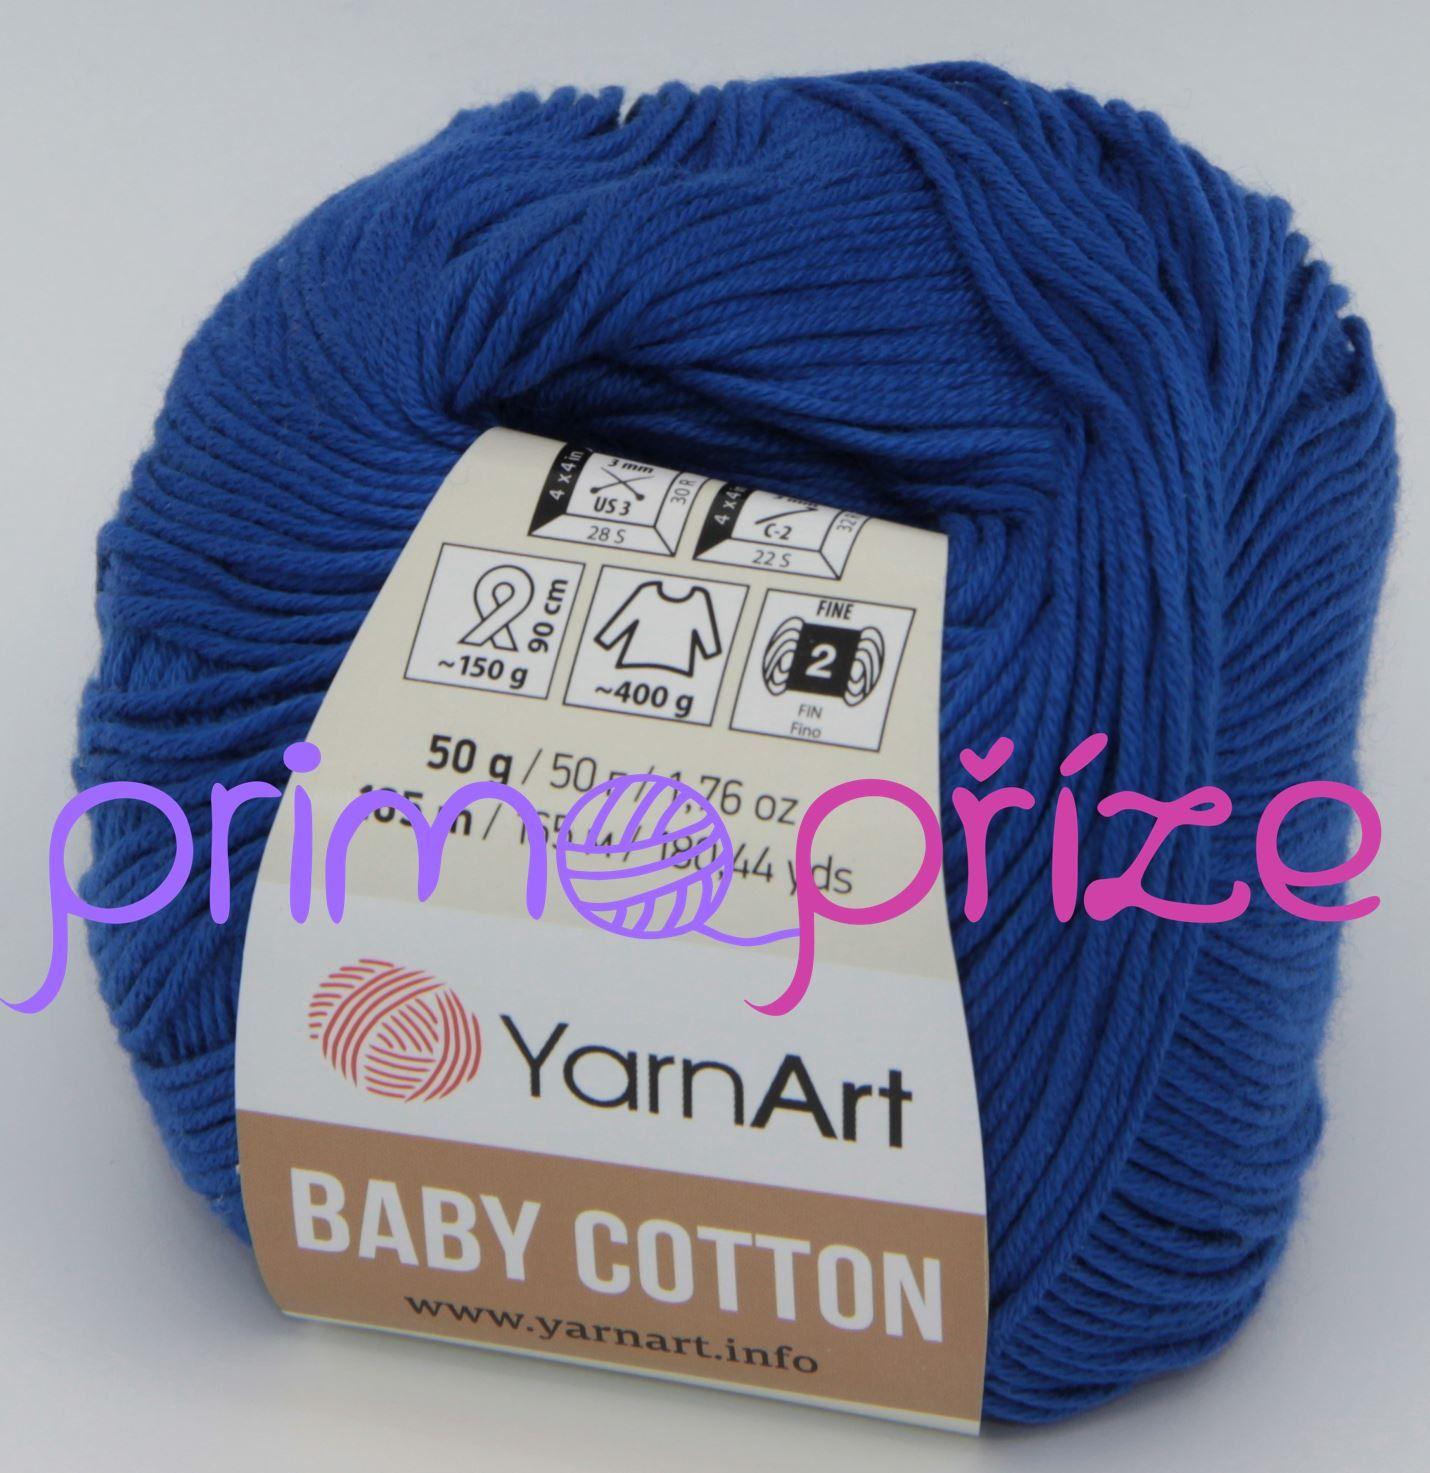 YarnArt Baby Cotton 456 modrá